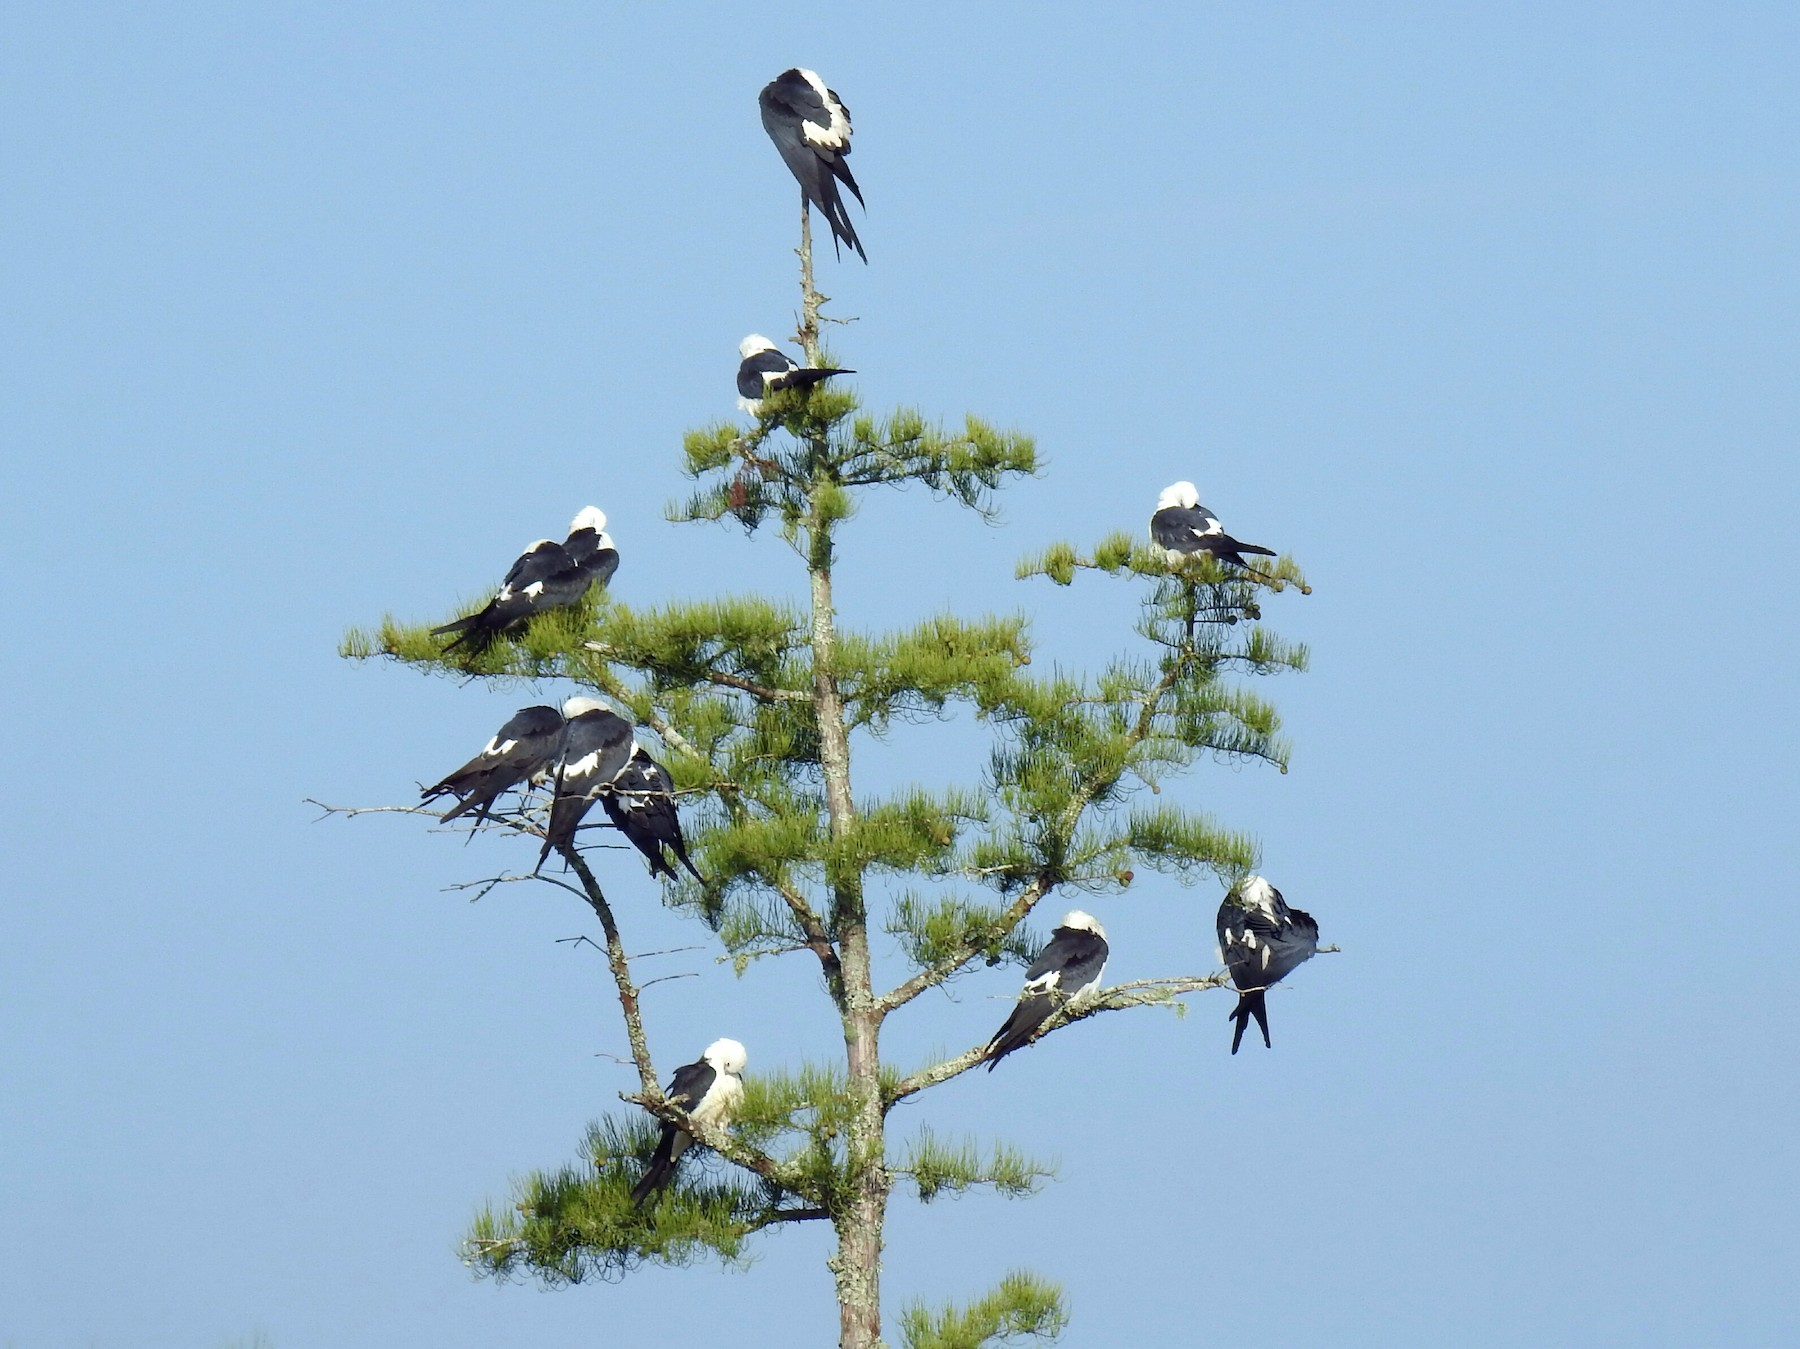 Swallow-tailed Kite - deborah grimes